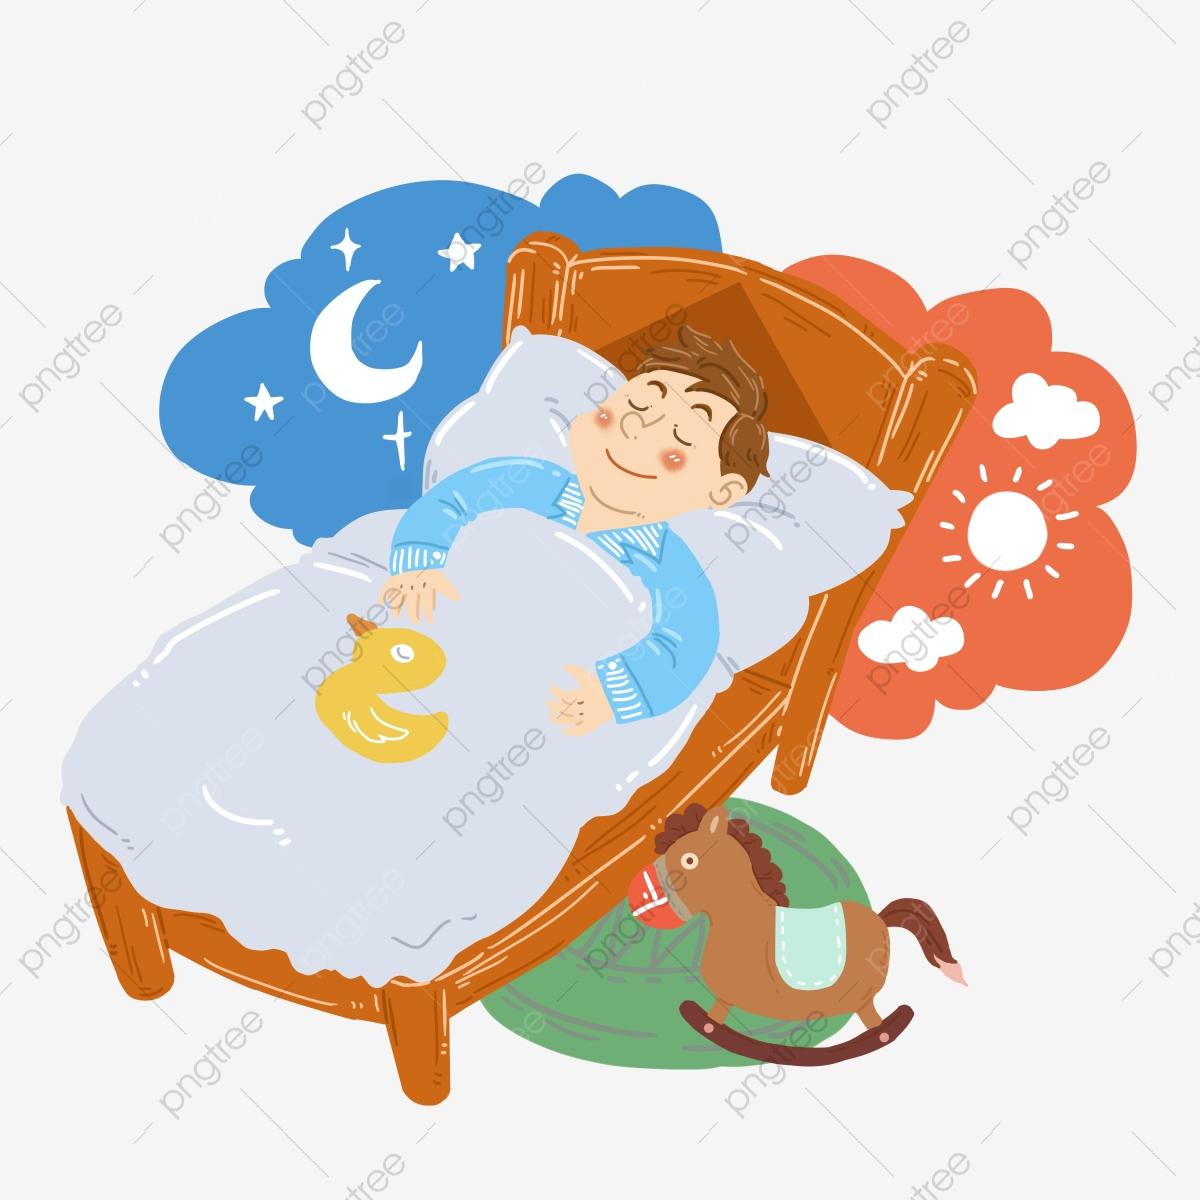 Little boy of sleeping. Dreaming clipart bedtime